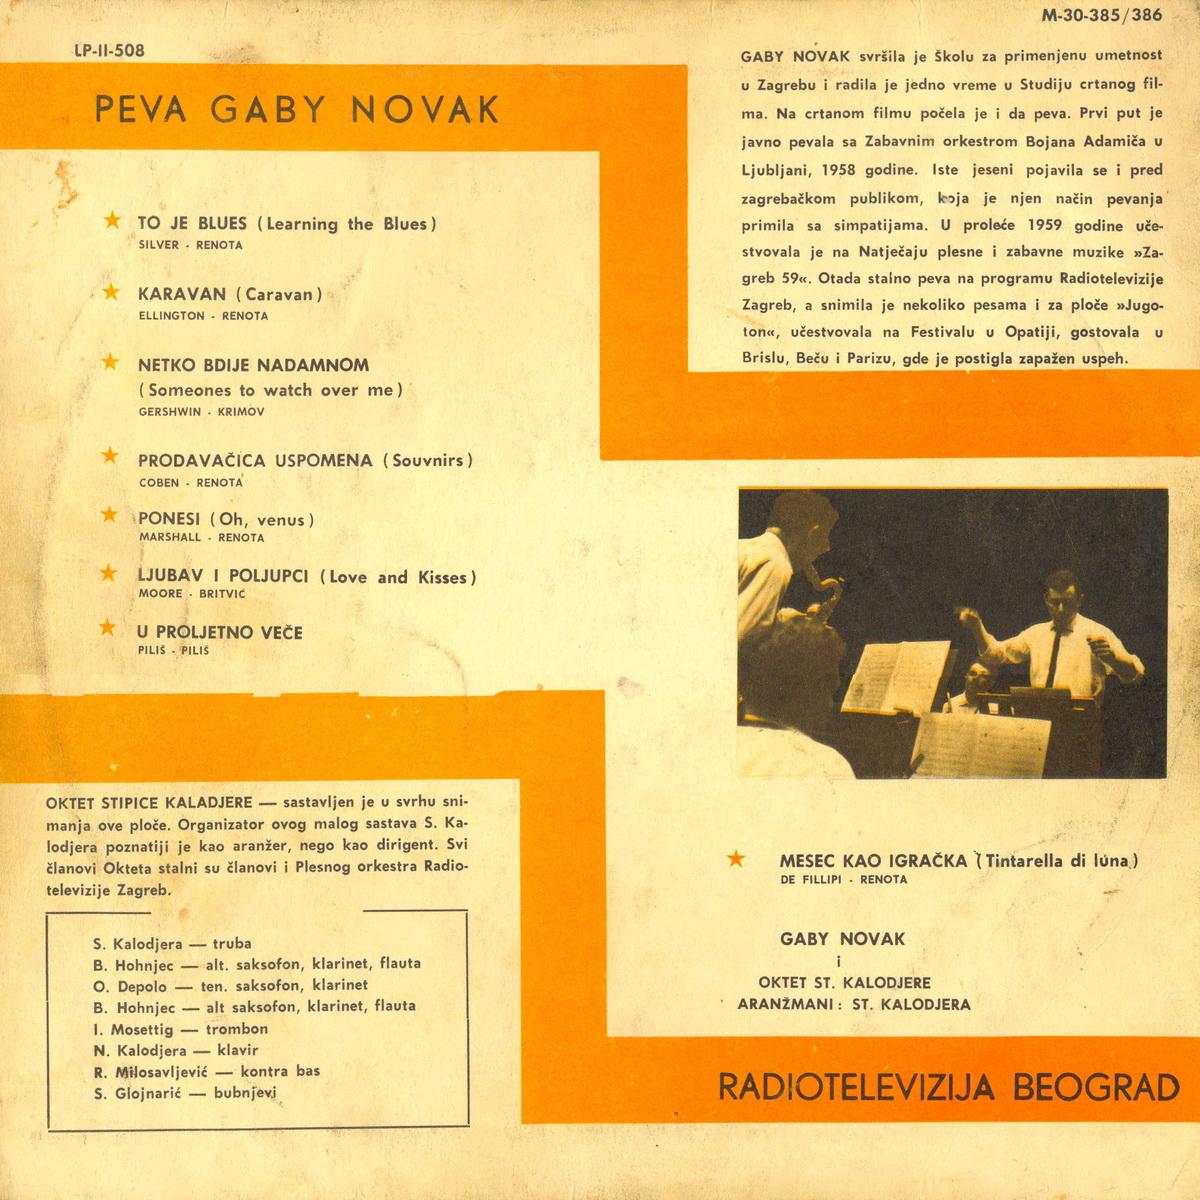 Gaby Novak 1961 Peva Gaby Novak b